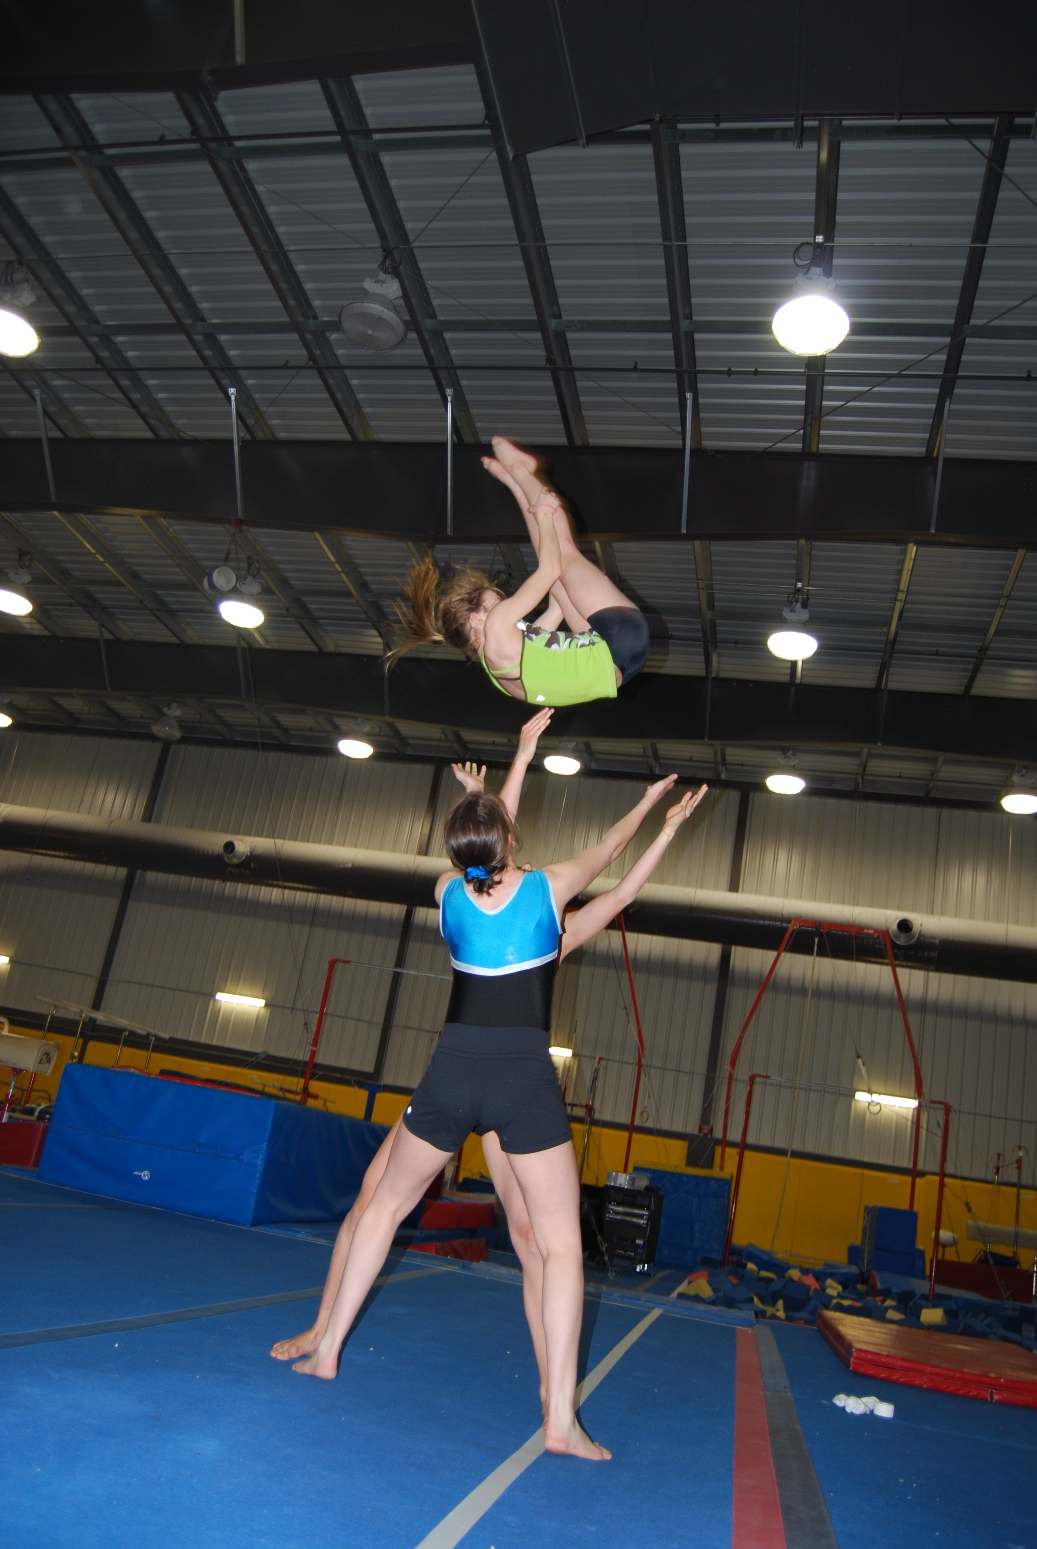 Rhythmic gymnastics practice